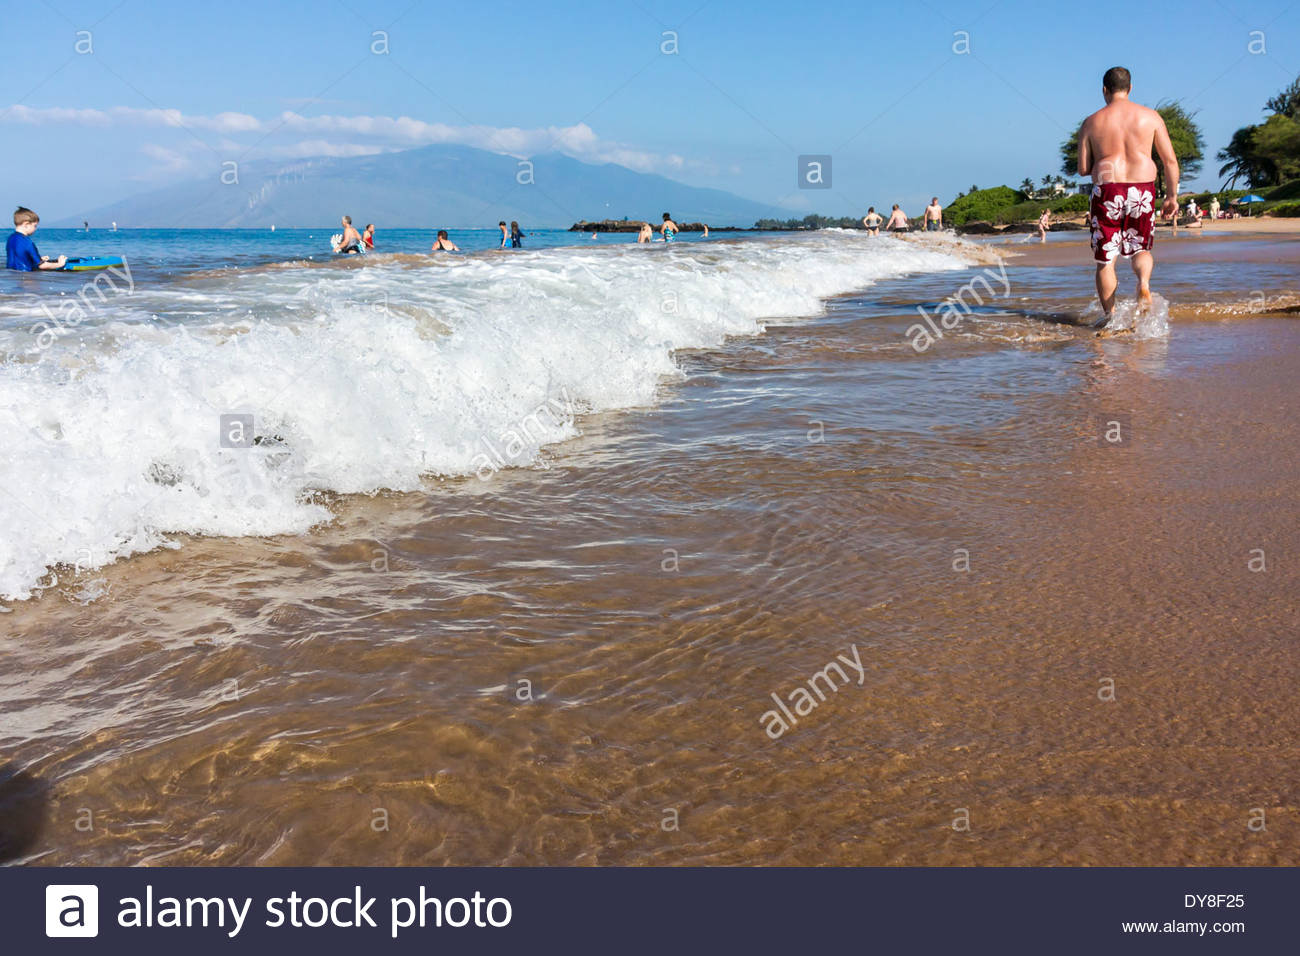 Surf crashing on to Kamaole Beach at Kihei on the island of Maui in the state of Hawaii USA - Stock Image